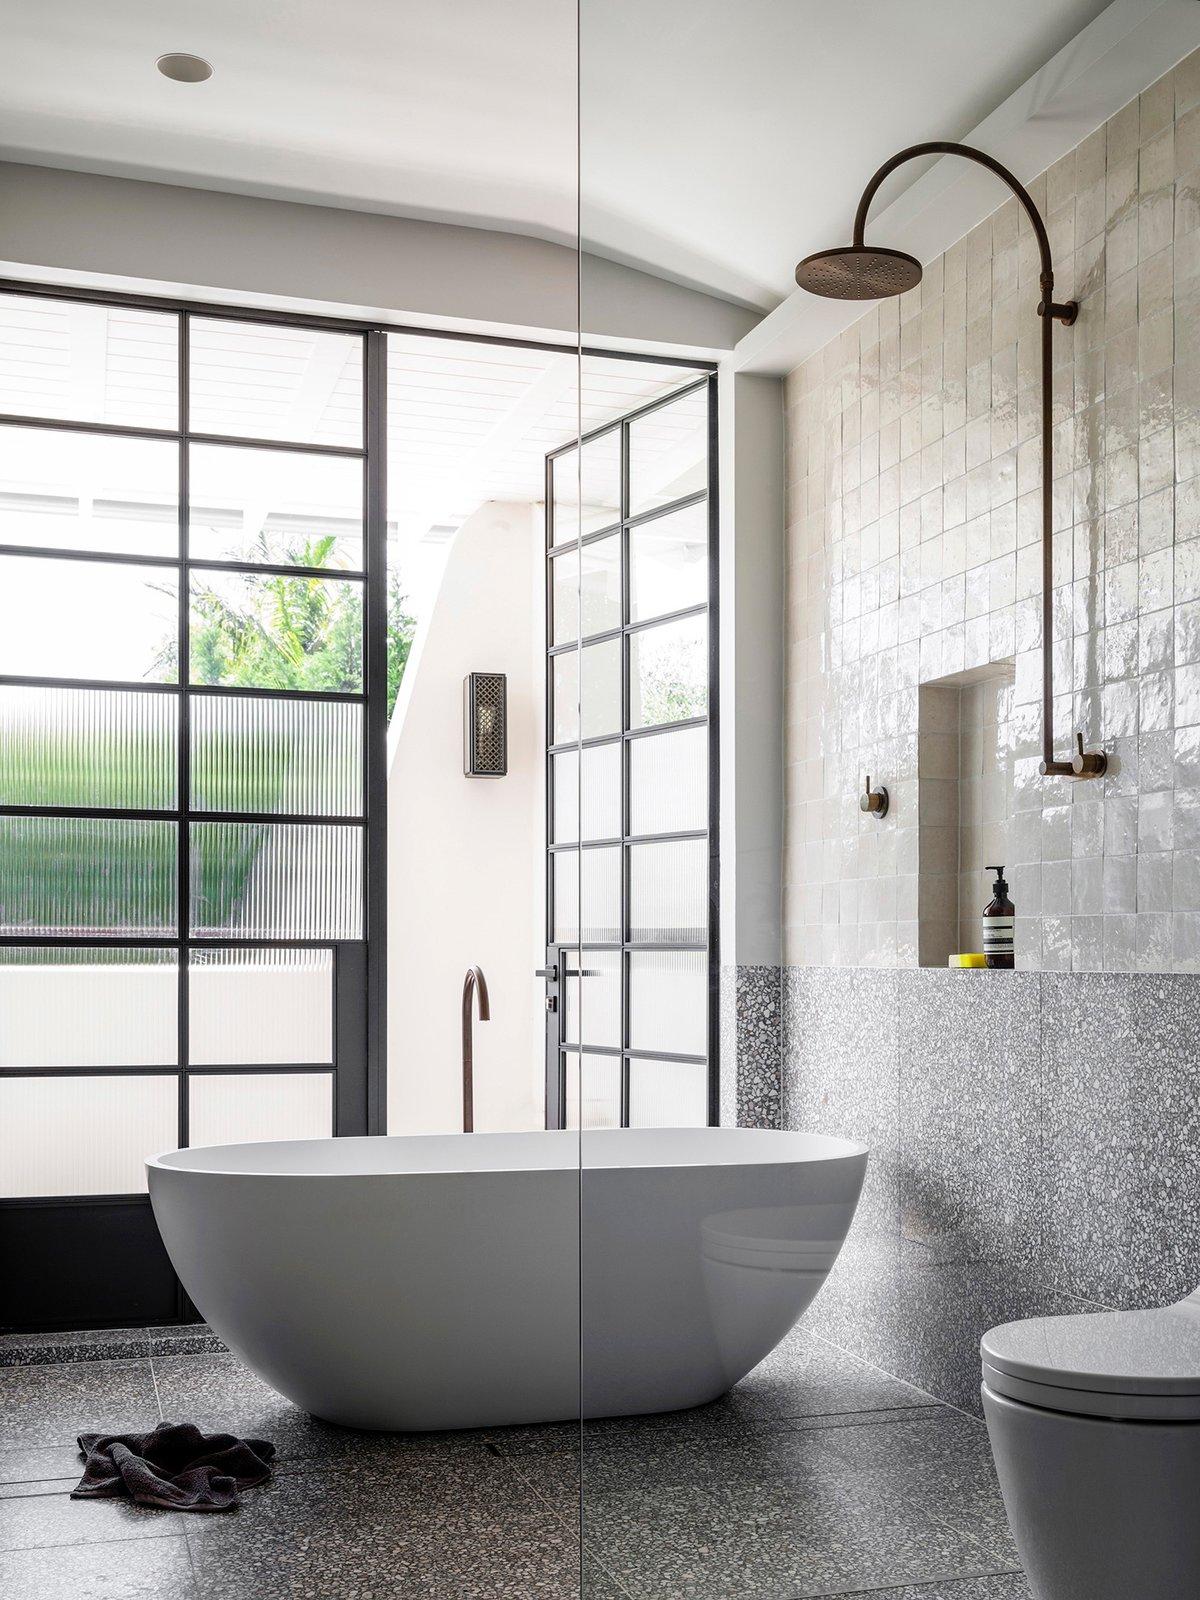 soaking indoor decor home japanese modern soak tub affordable